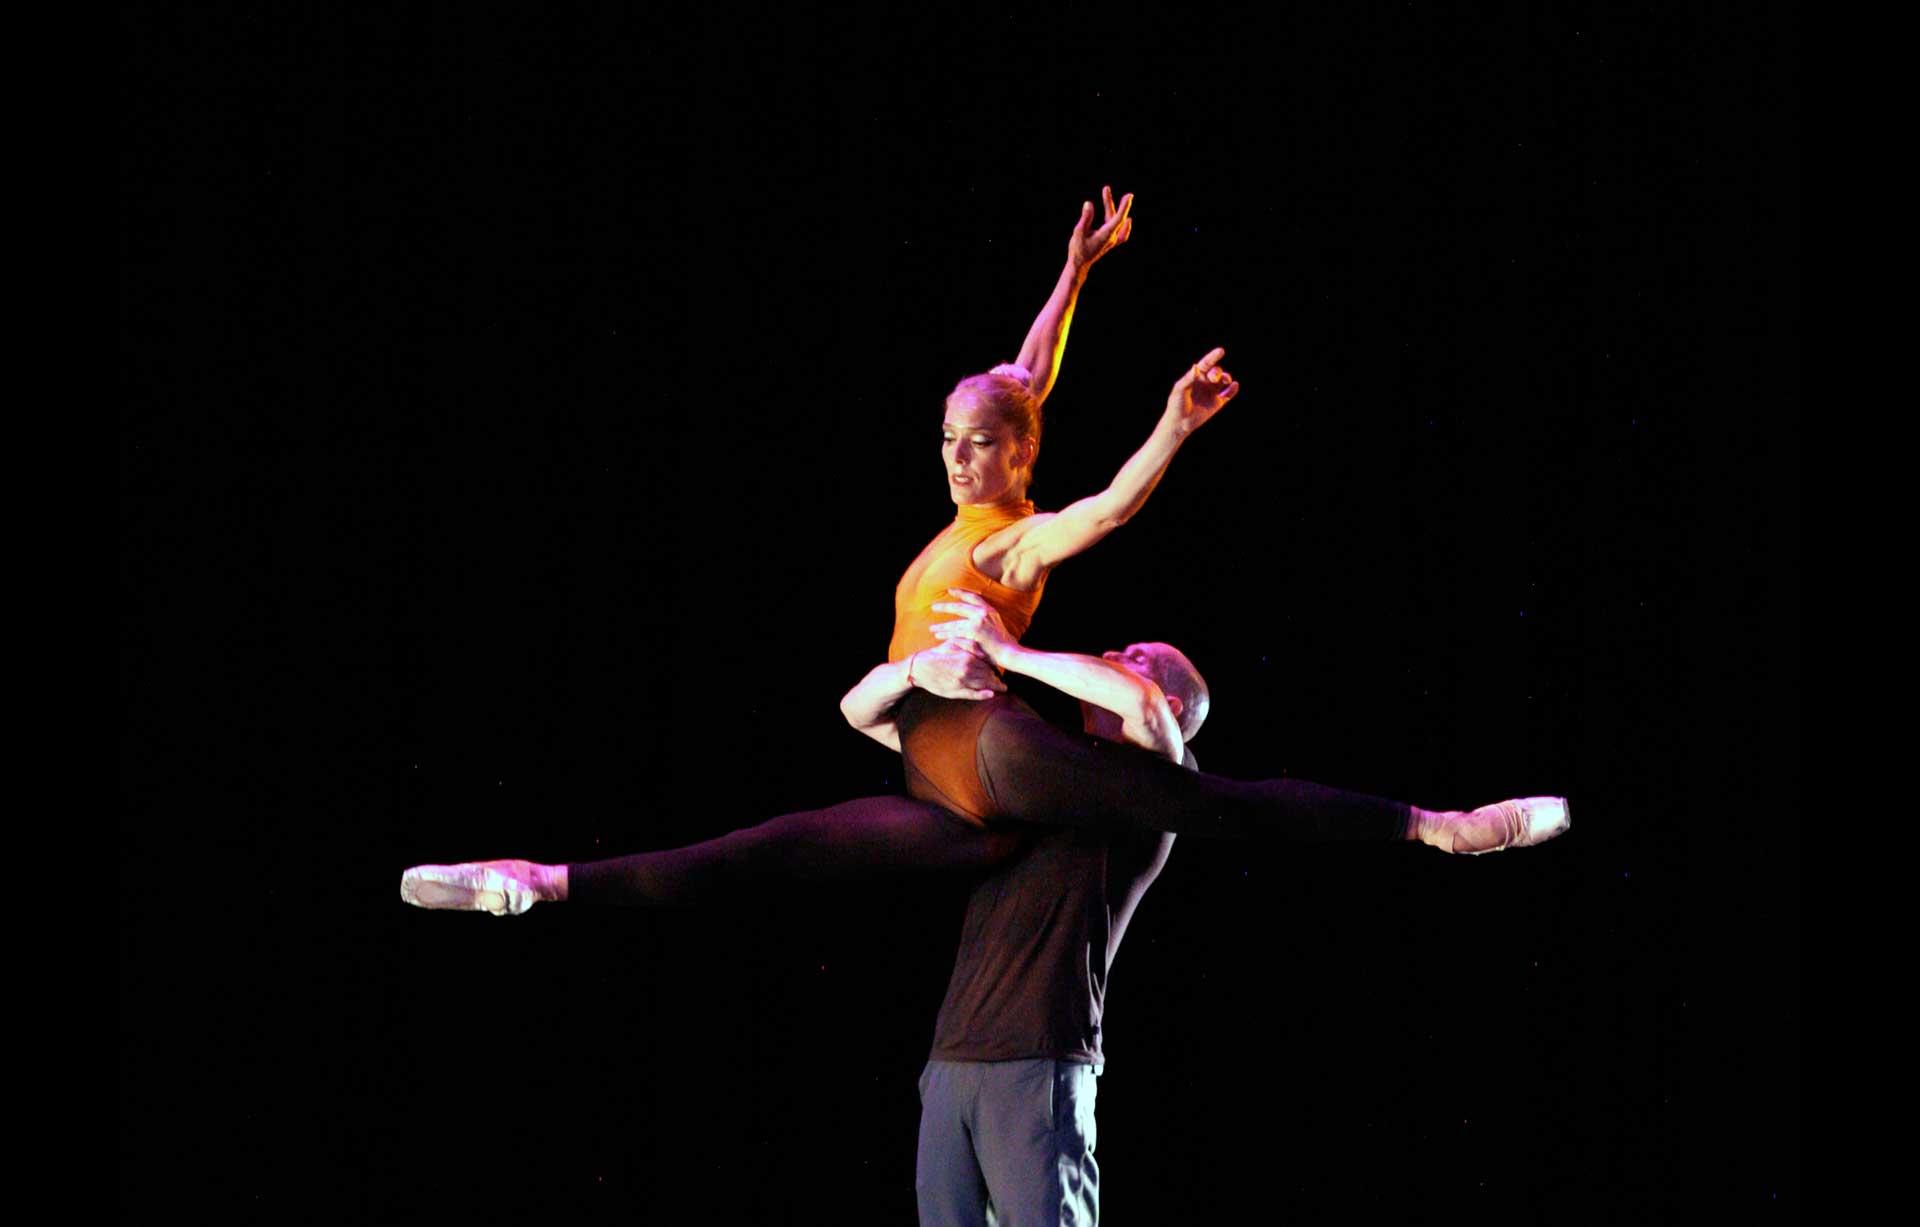 Bach 260 Robert Sher-Machherndl + Minna Tervamaki  Lemon Sponge Cake Contemporary Ballet